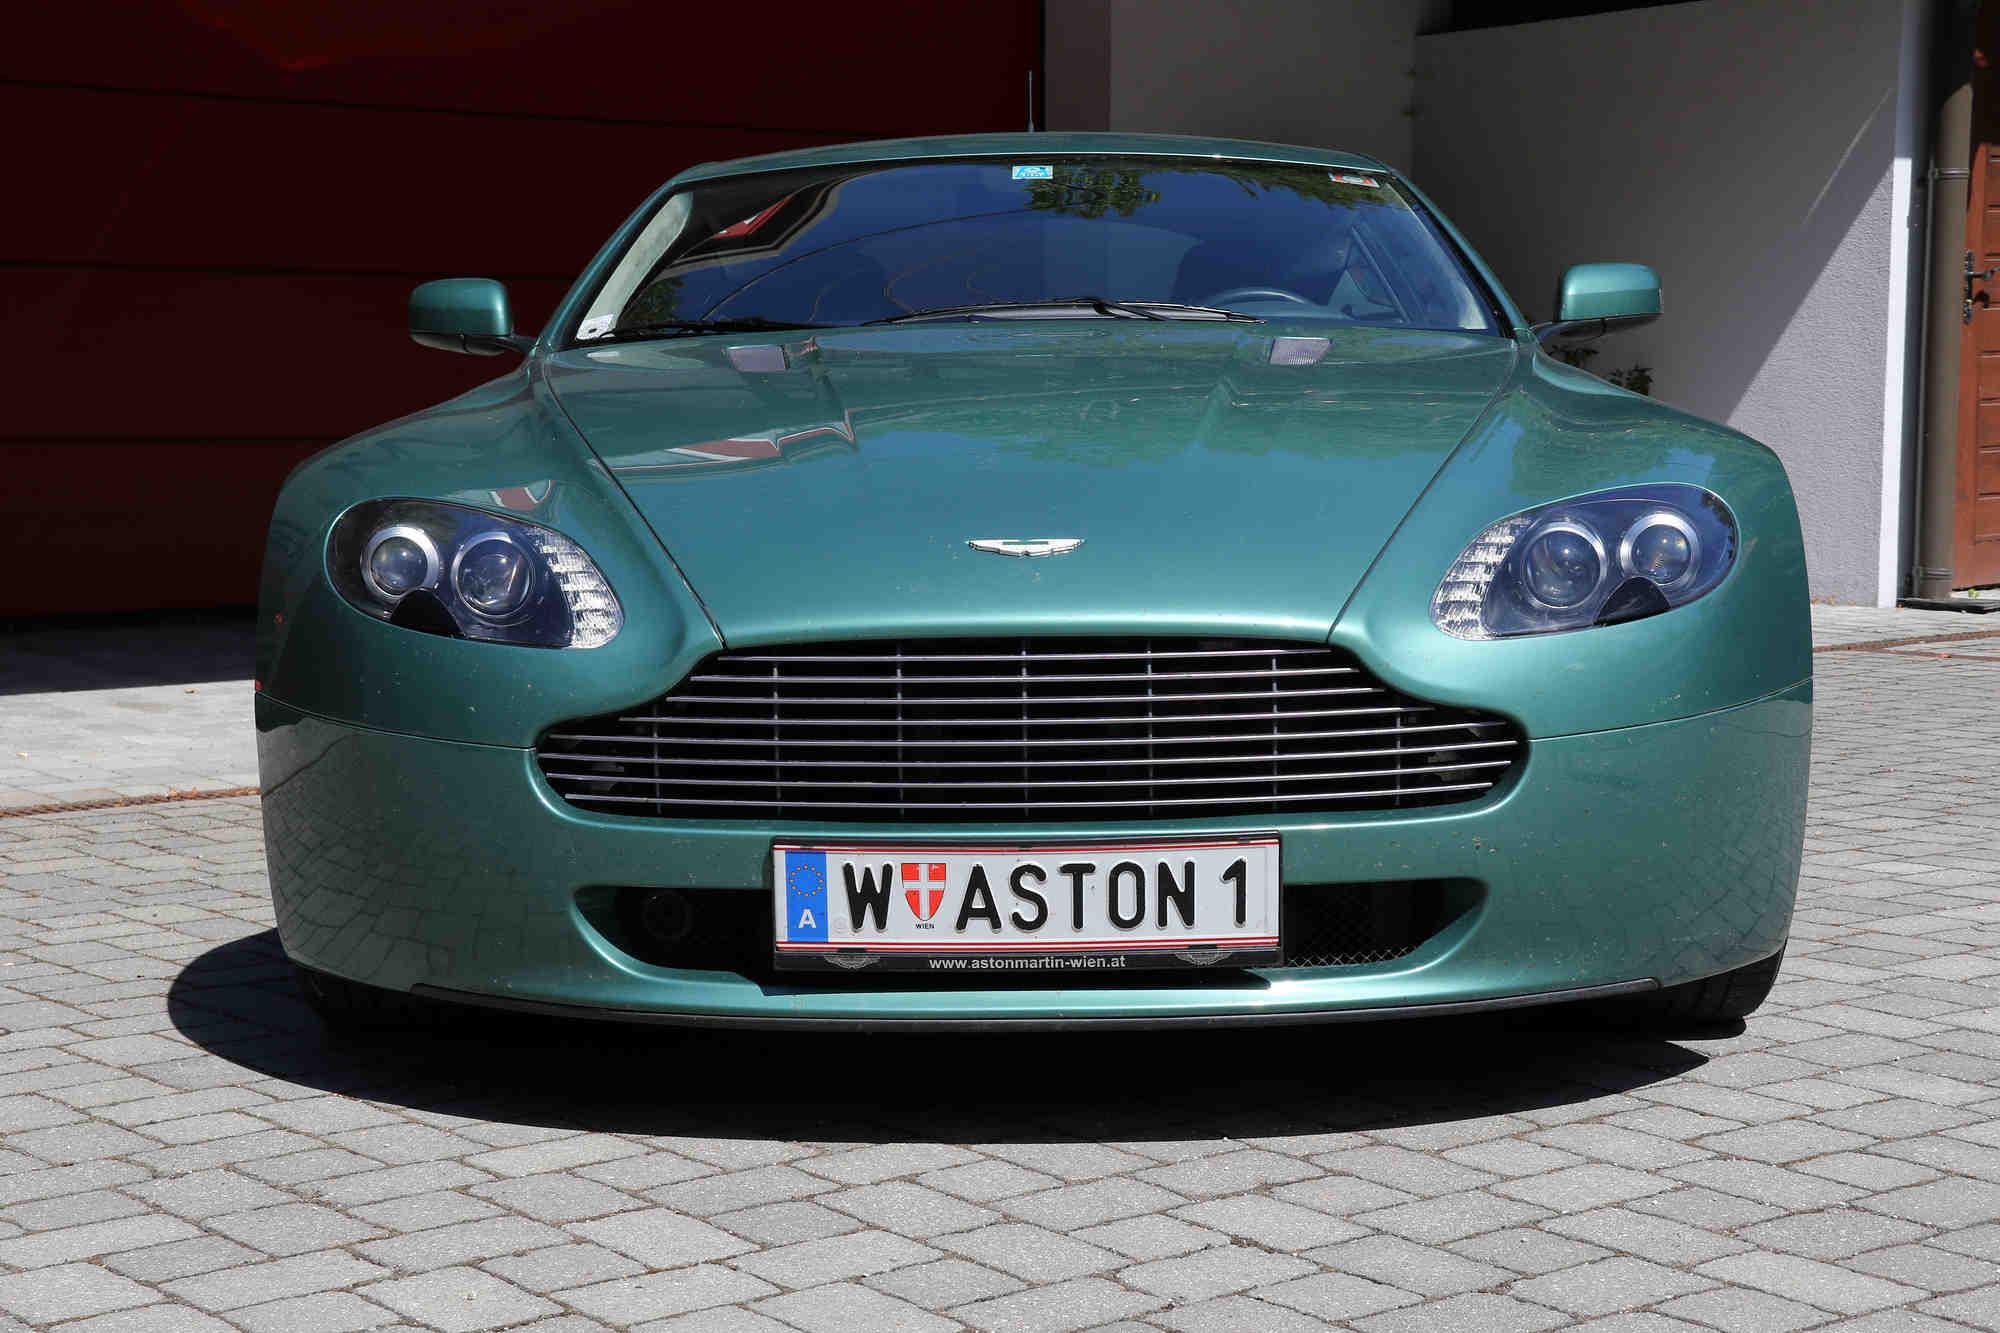 Aston Martin V8 Vantage, Bj. 2006